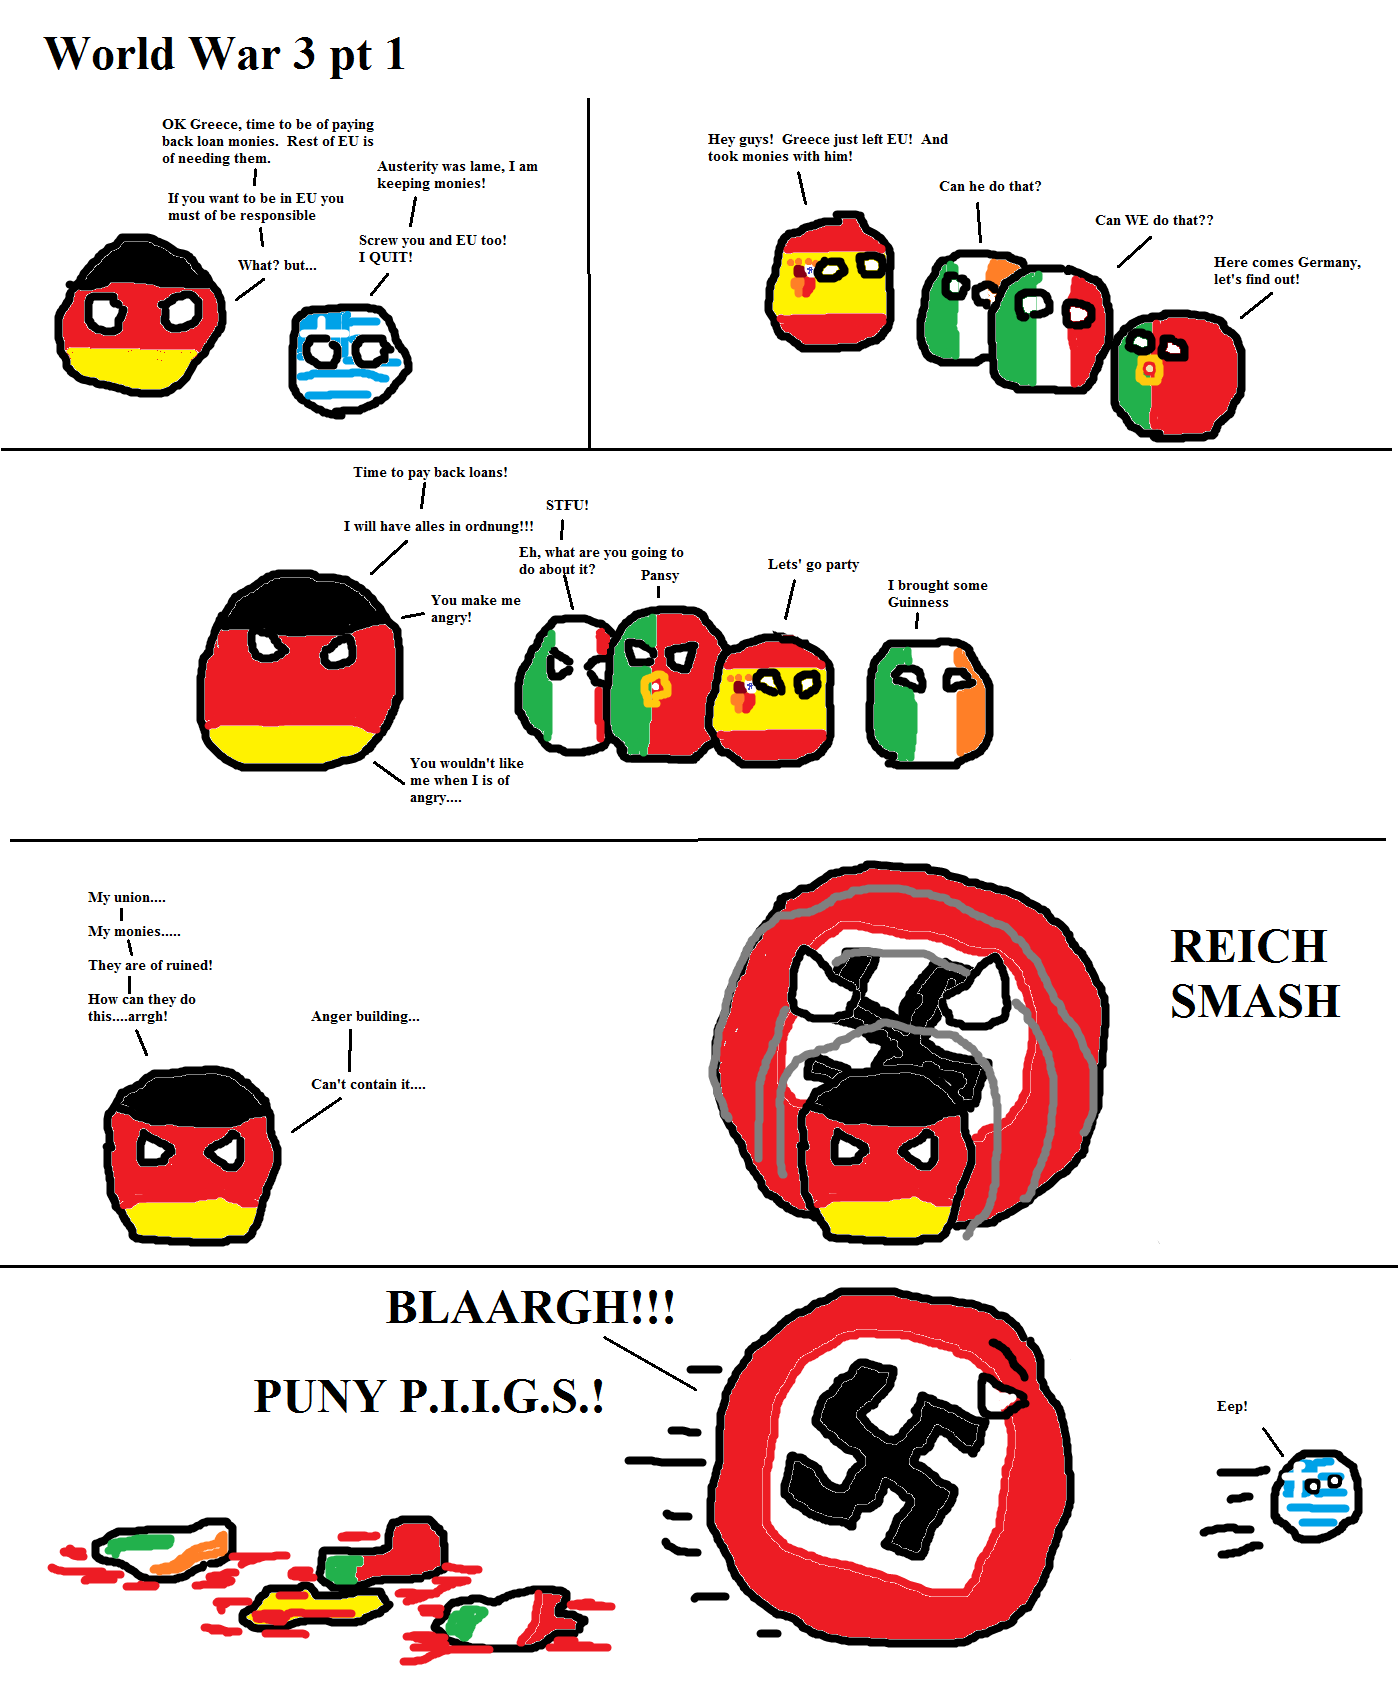 WW3_Part_1_-_Polandball.png